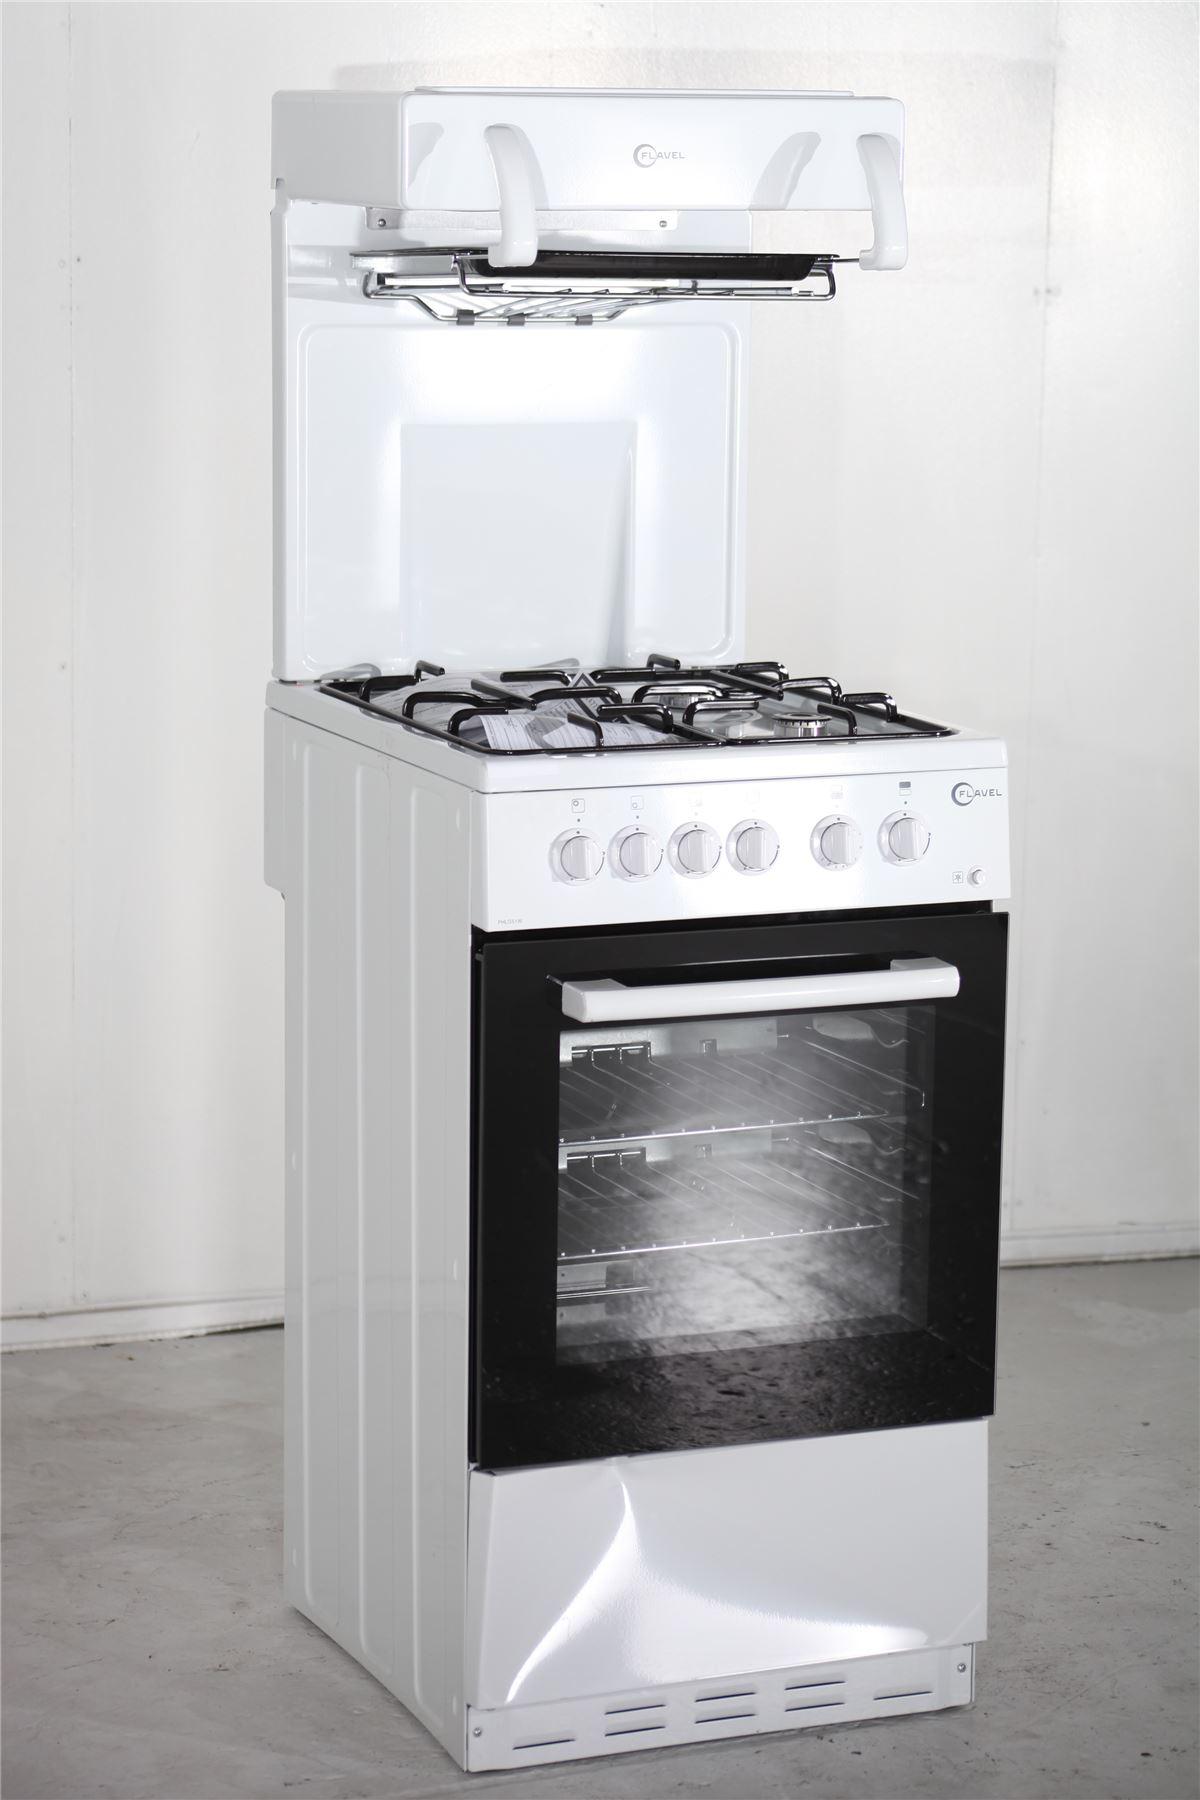 Preloved Kitchens For Sale